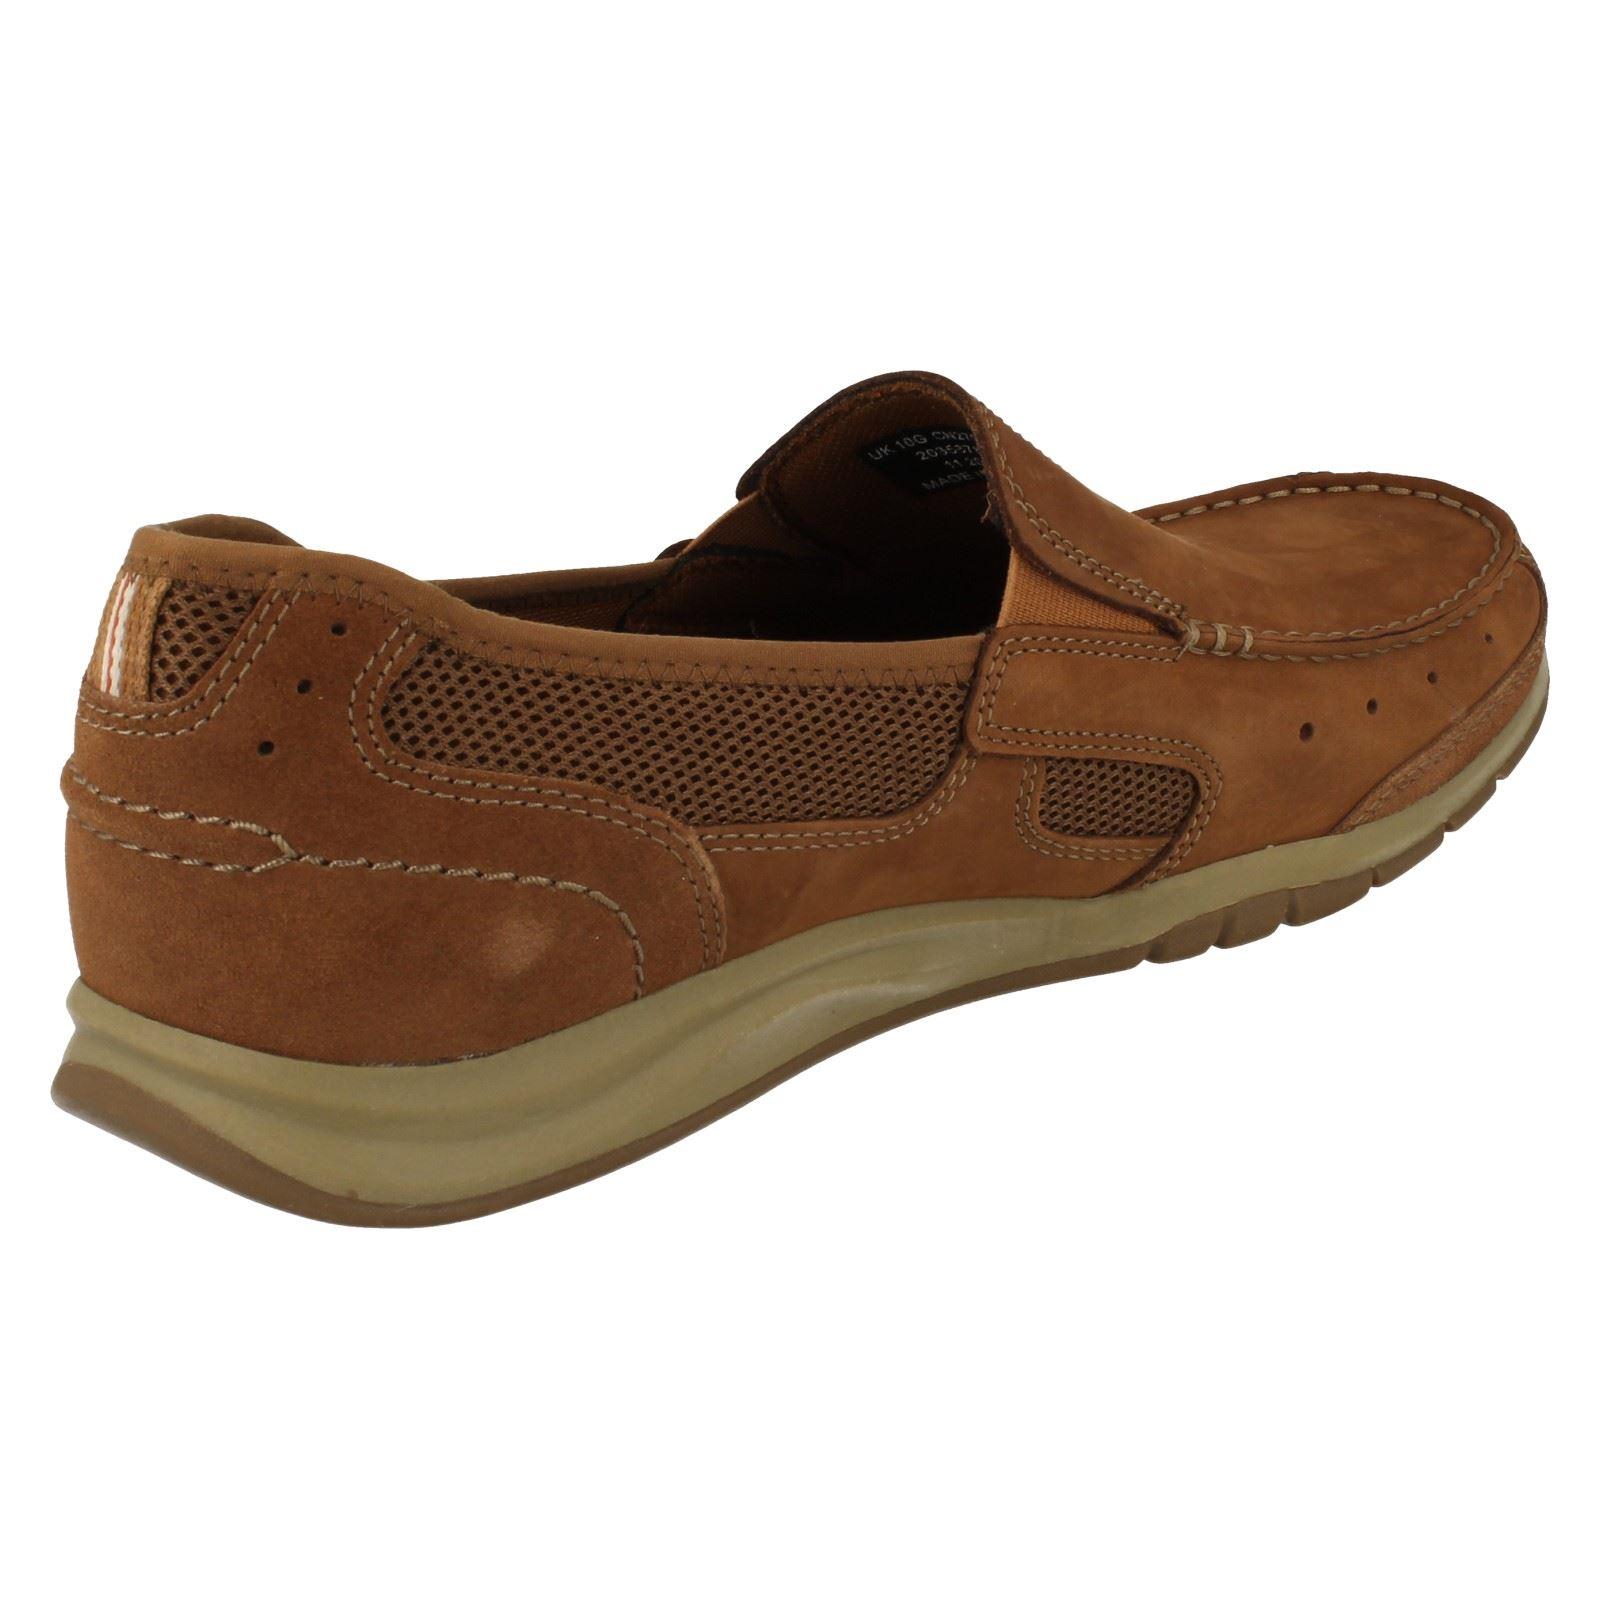 mens clarks slip on shoes ramada ebay